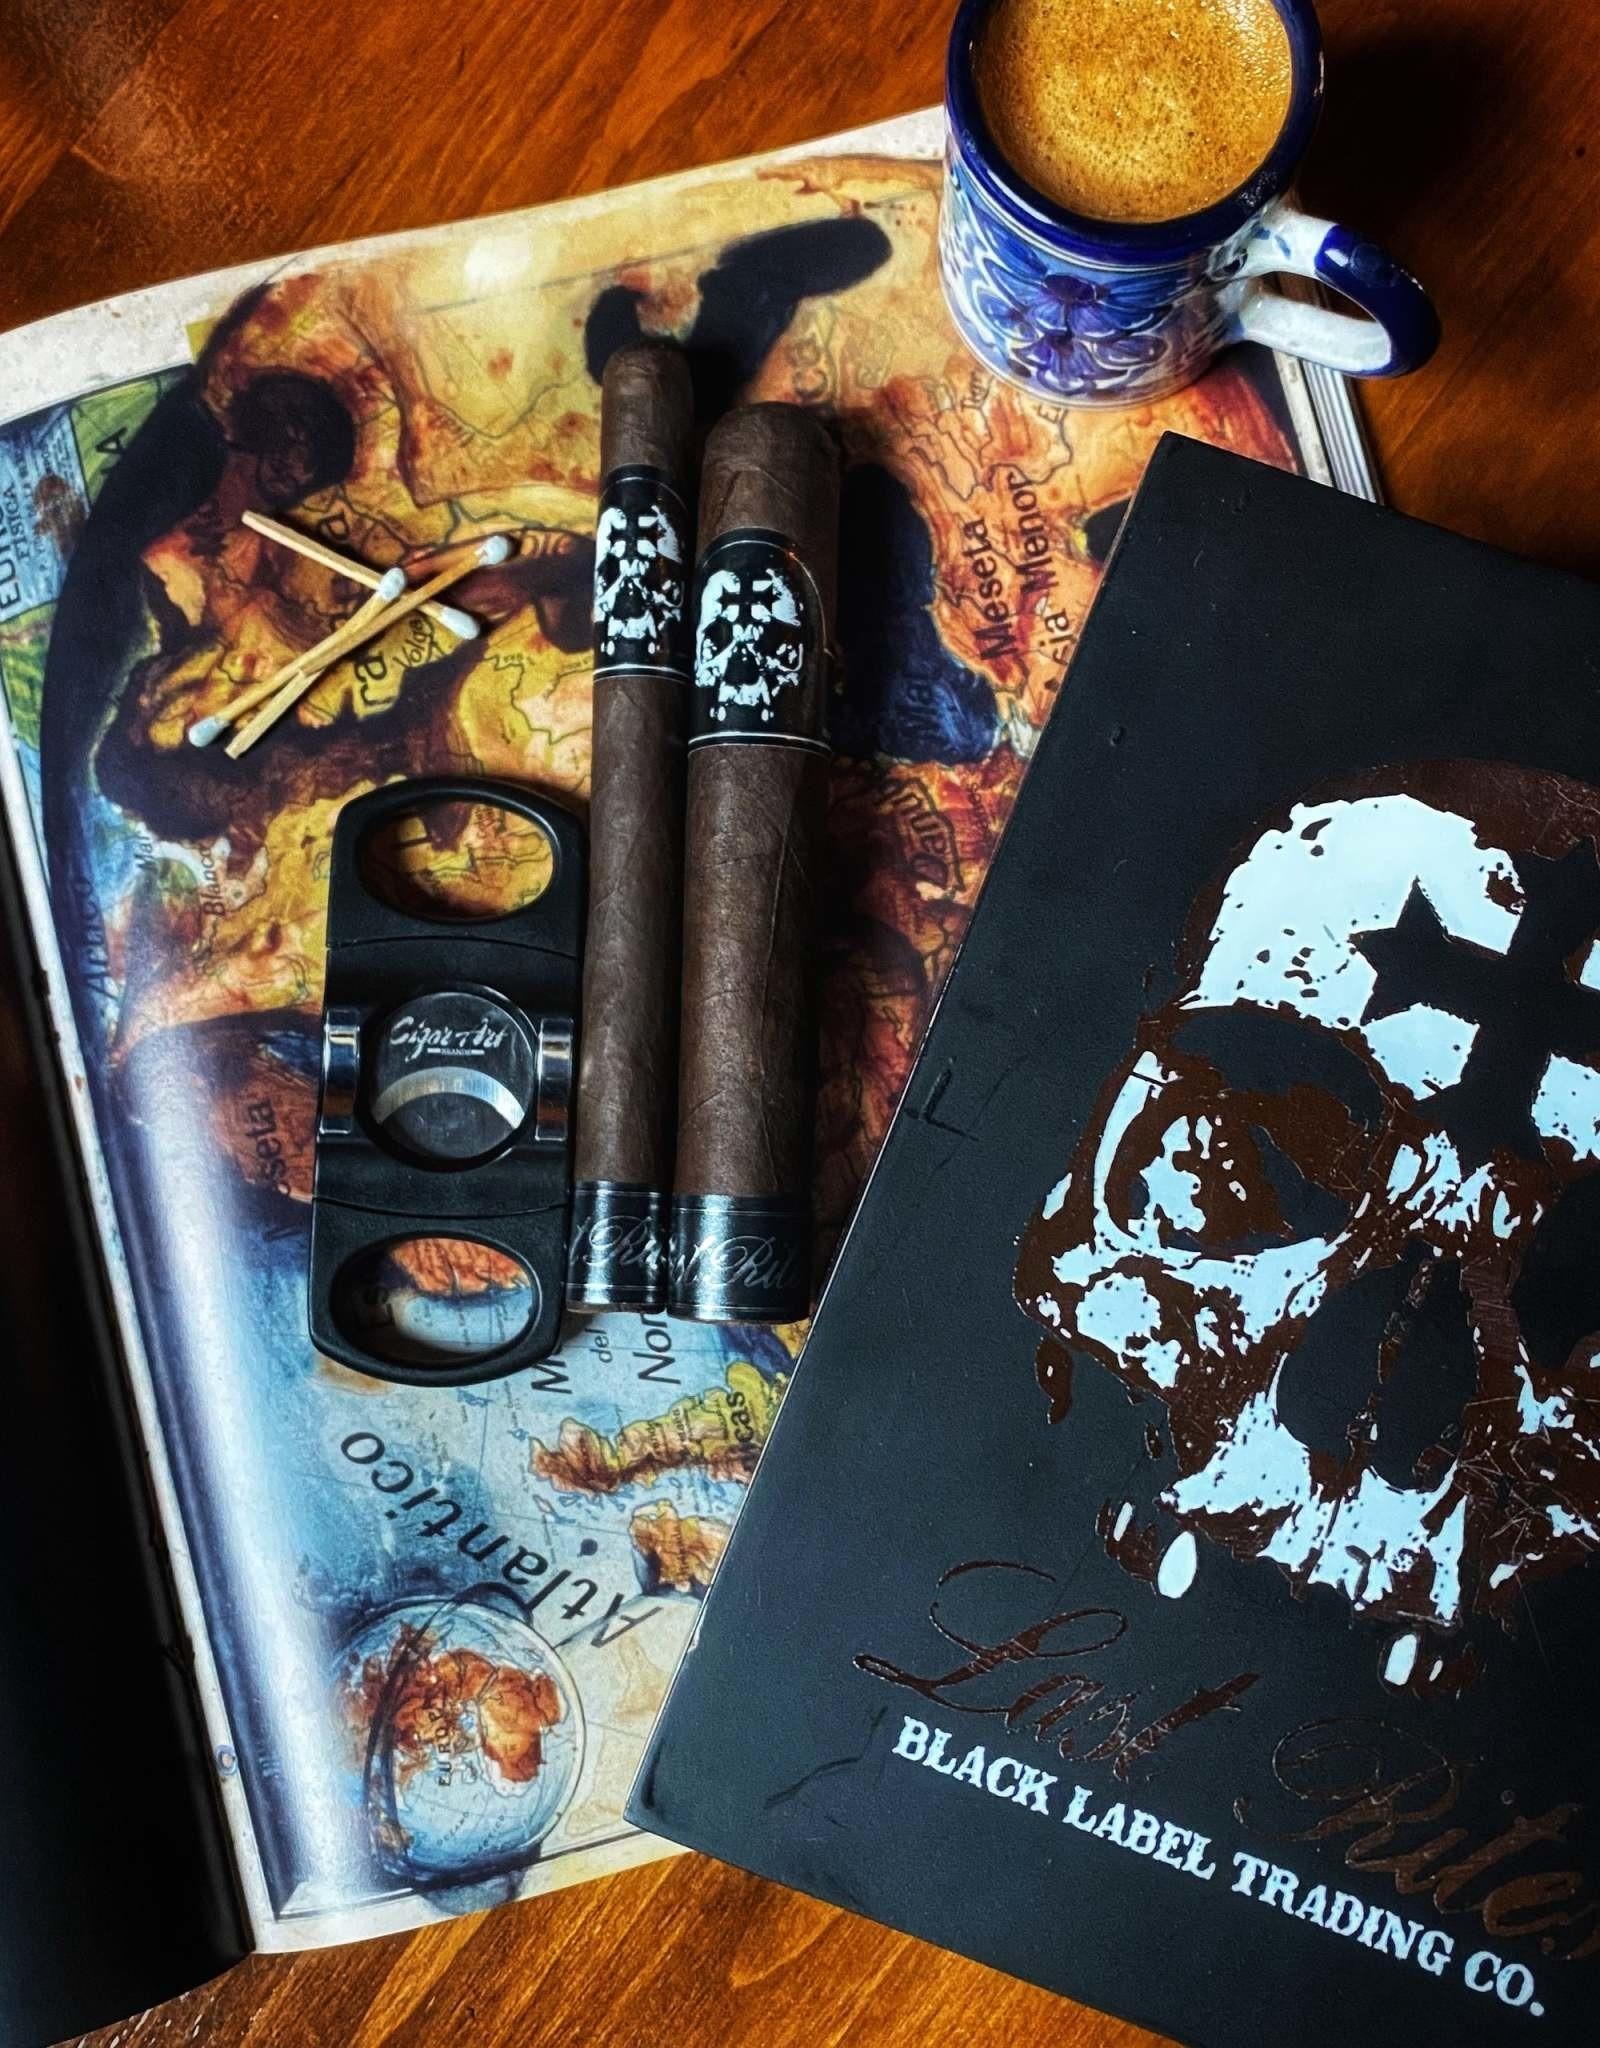 Black Label Trading Co Black Label Trading Co. Last Rites 6 x 60